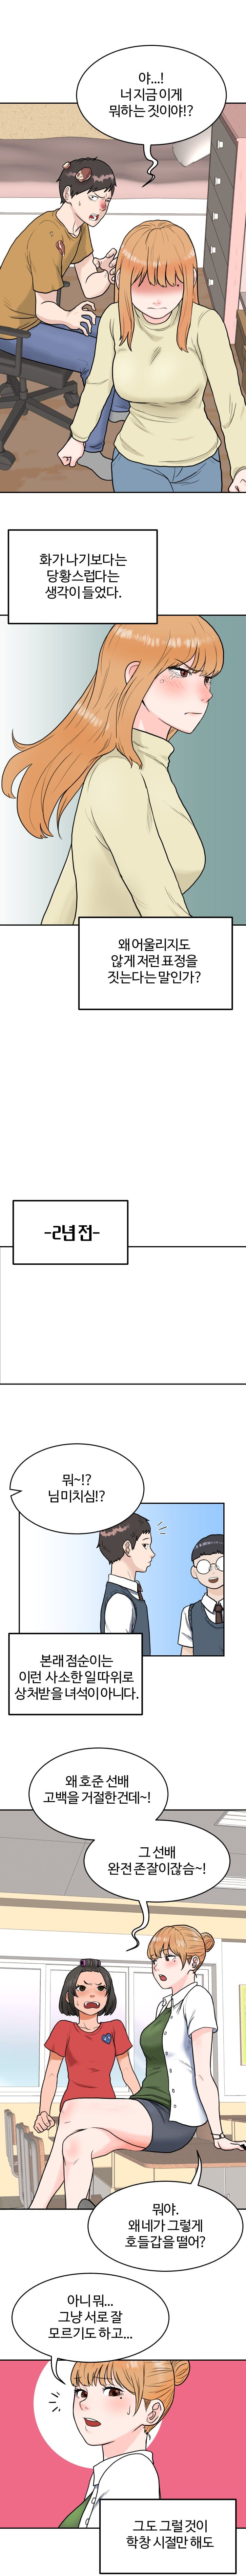 viewimage.php?id=2ebcc232eadd36&no=24b0d769e1d32ca73feb86fa11d02831b7cca0f2855e21730c7240ebbd076d505b10c08ba75e26f70c20672b712454cea92c34b77bcbaec01b34c8e38240b52dc65d0a